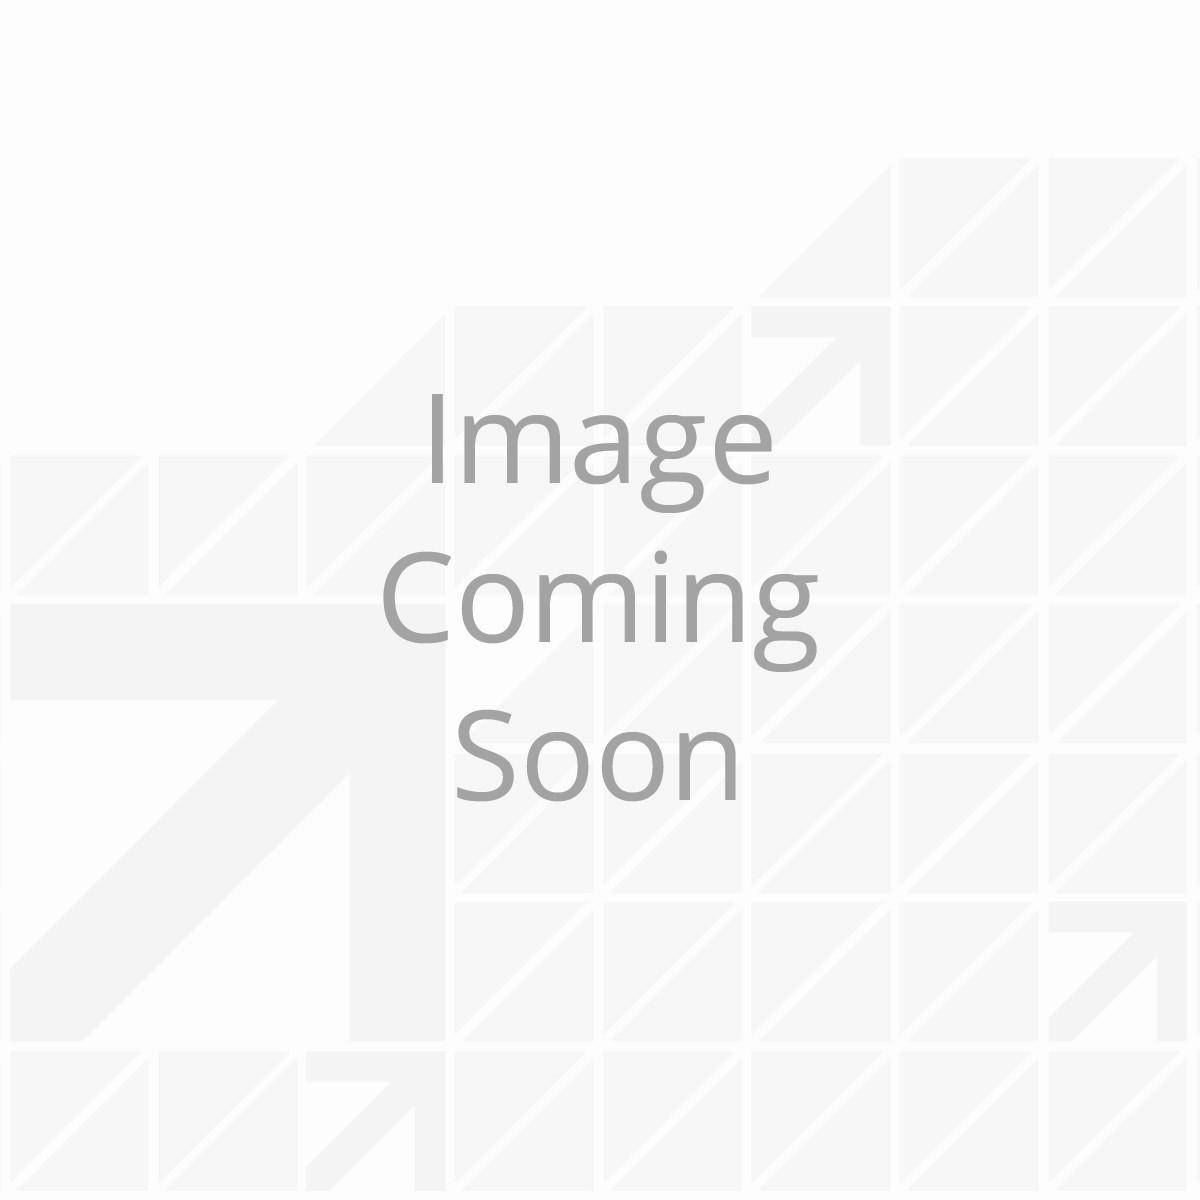 Inner Bearing Race - 10,000 lbs. Axles